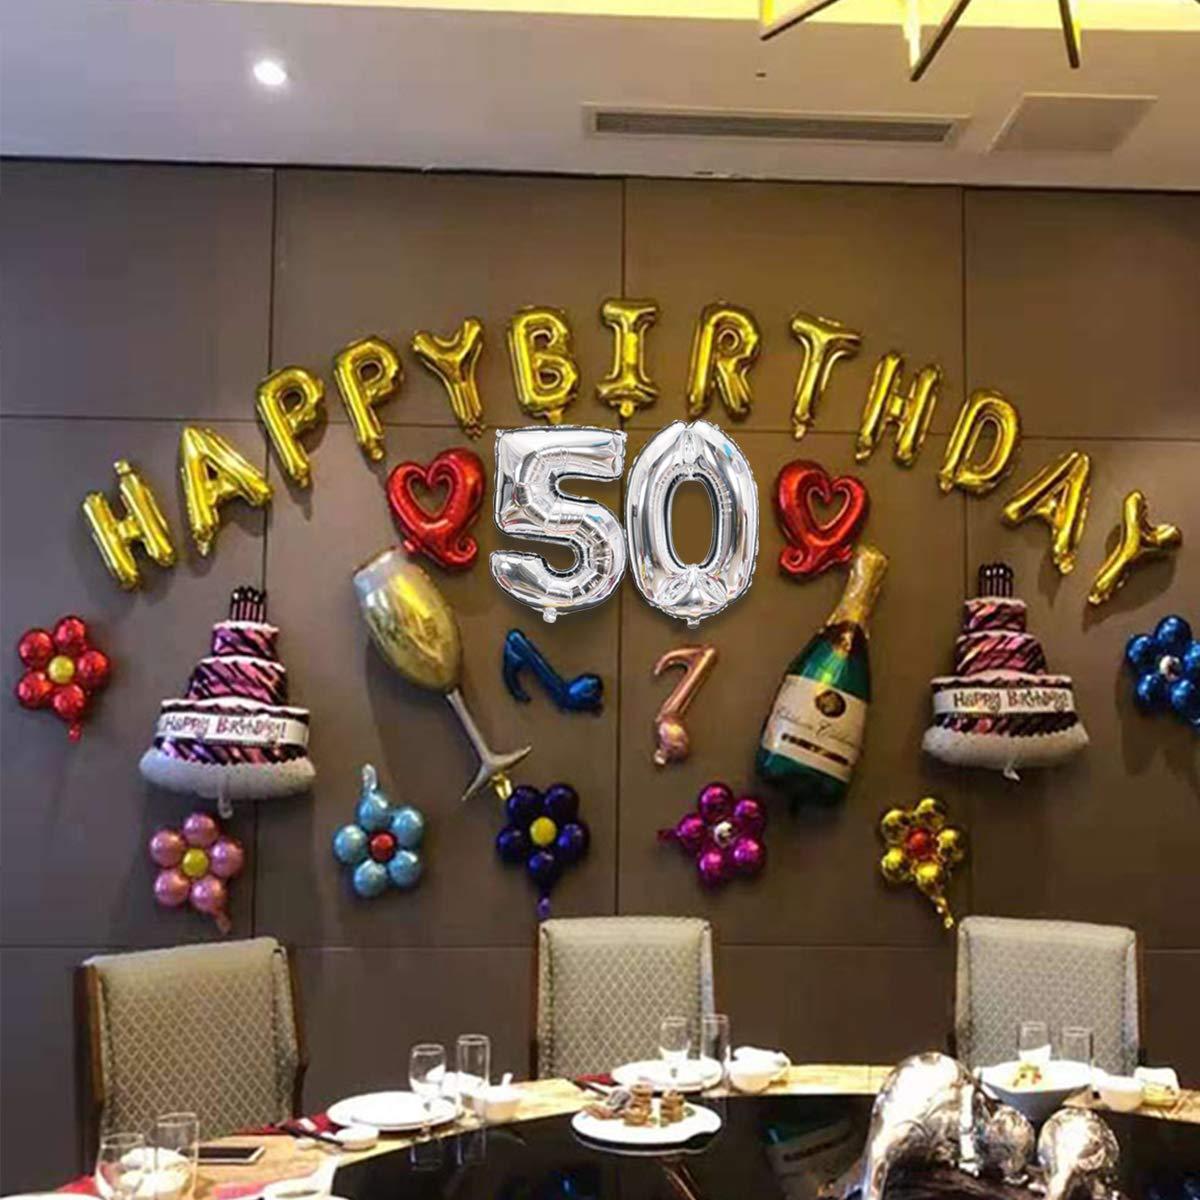 Meowoo Palloncini 50 Anni Palloncini Compleanno 50 Palloncini Compleanno 50 Anni Compleanno Argento 1 PCS